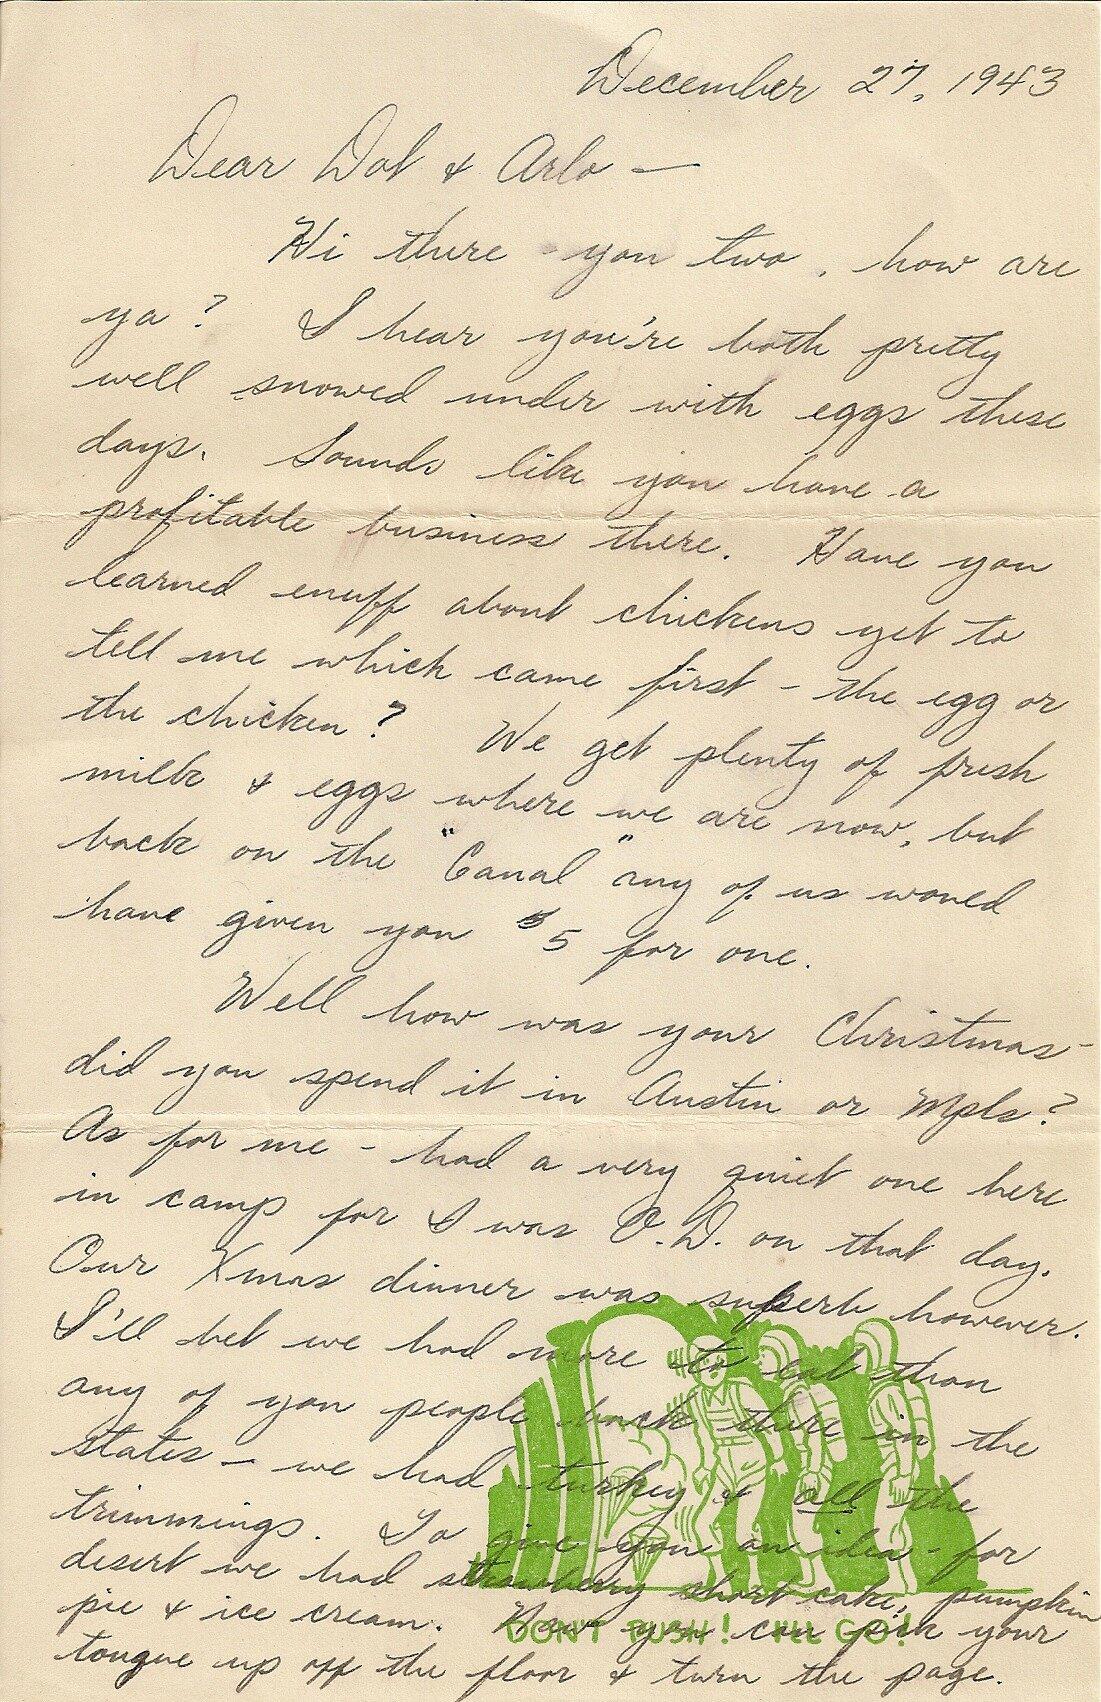 December 27, 1943 (To Dorothy Jordan